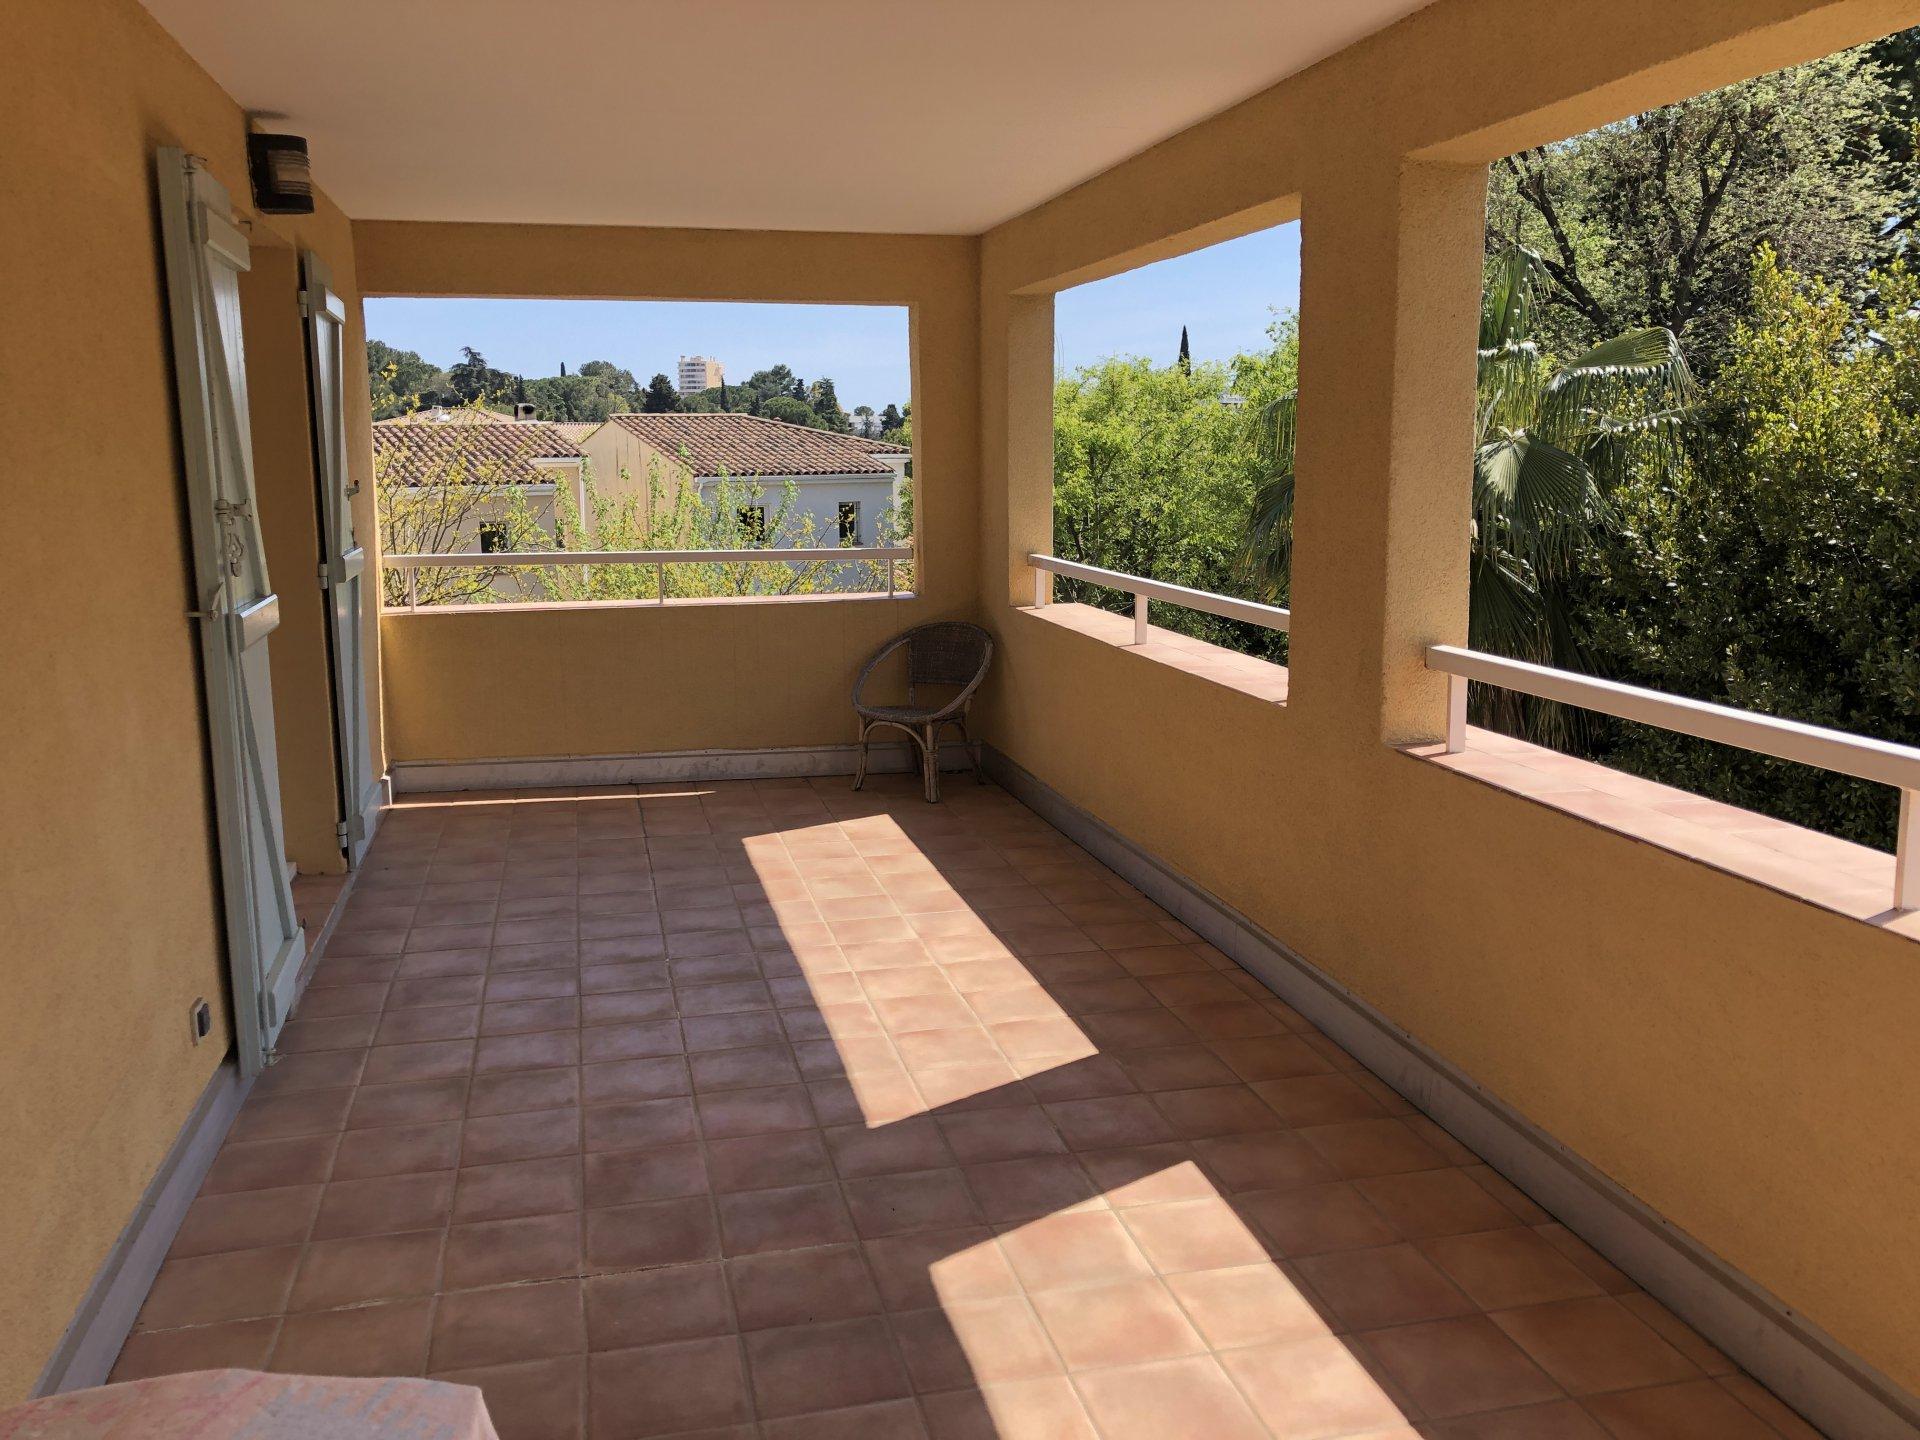 Antibes (06600) - Villa 110 m2 dans lotissement